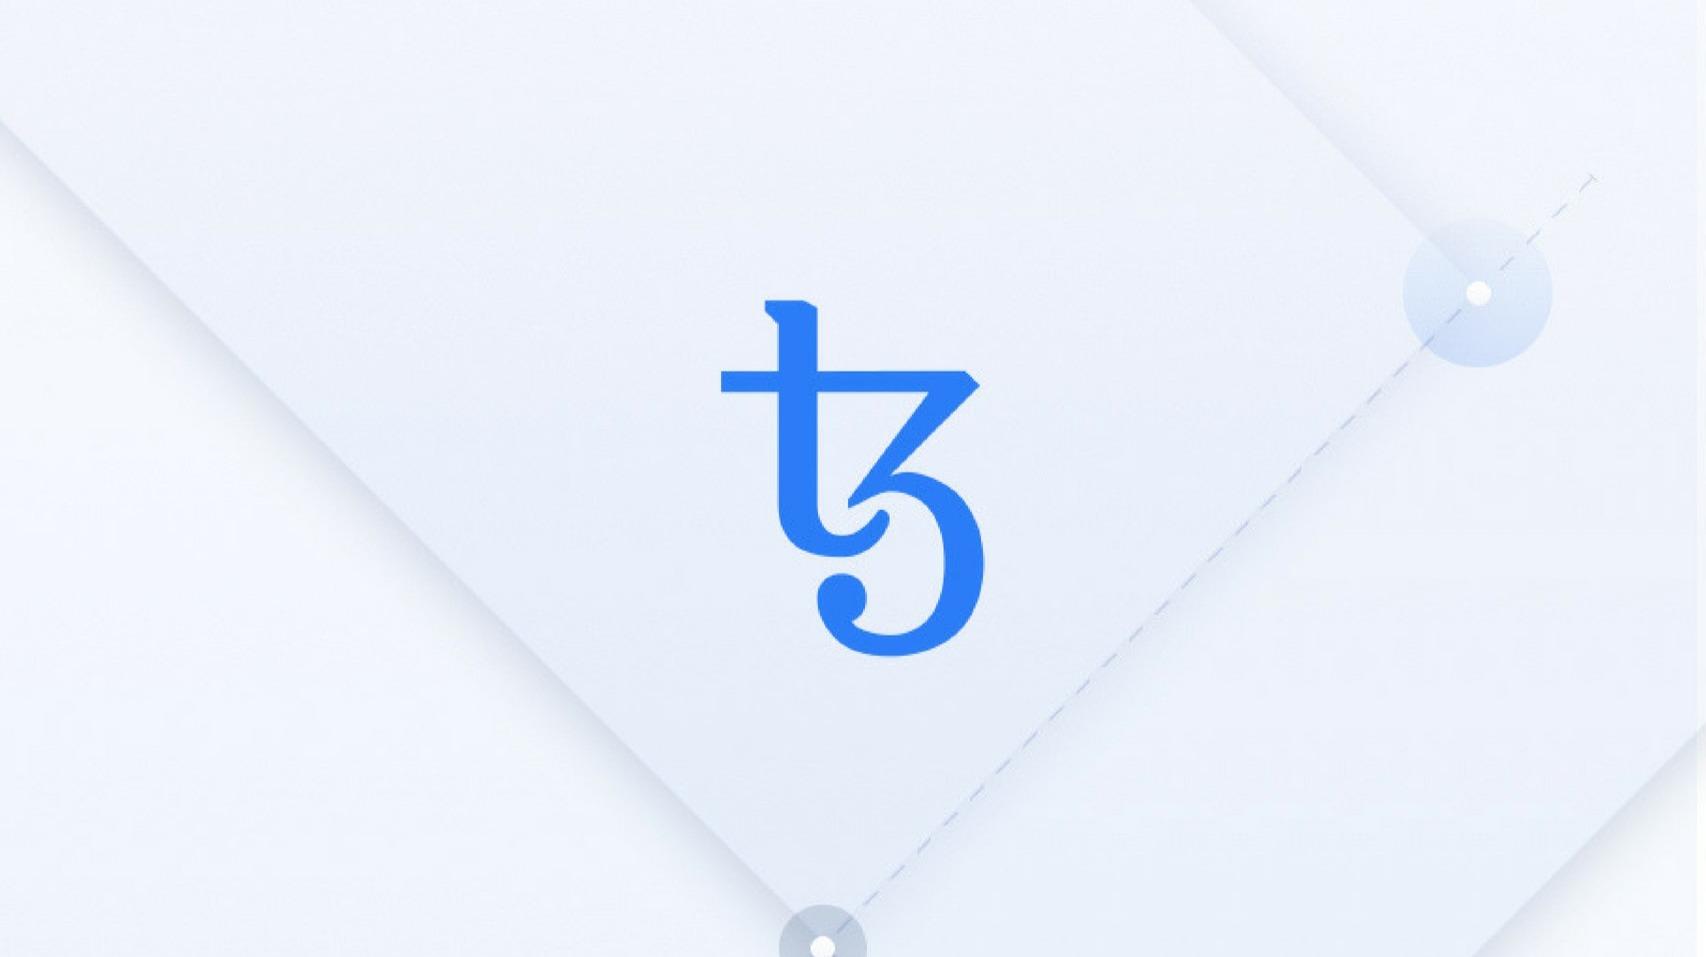 https://www.investinblockchain.com/what-is-tezos/